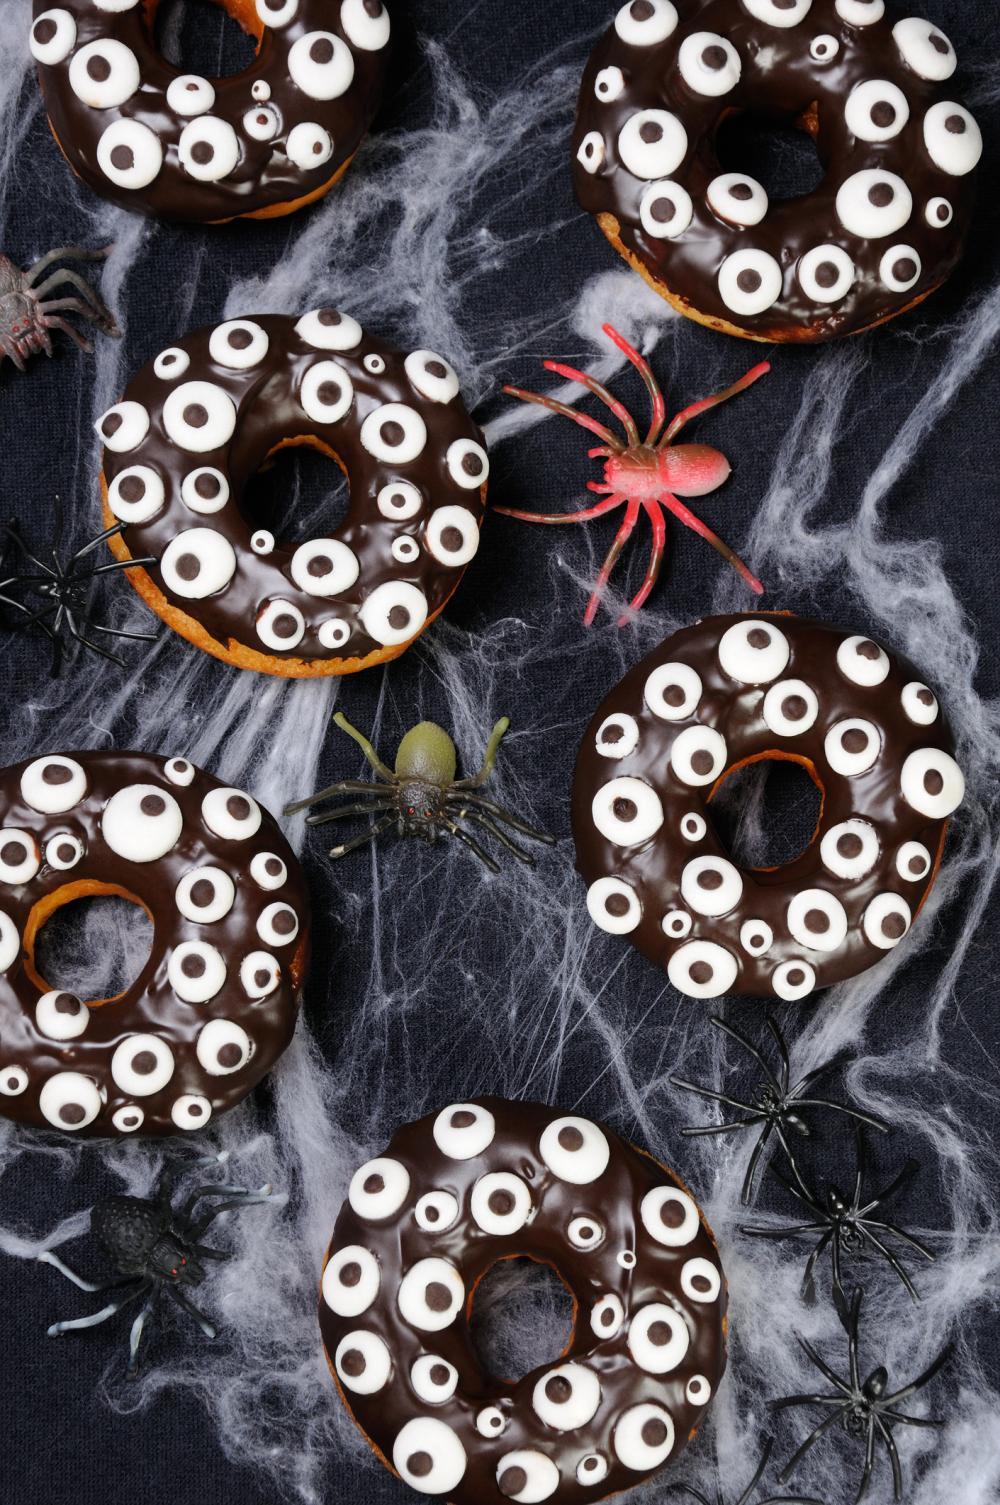 Eye monster donuts kid food ideas for halloween